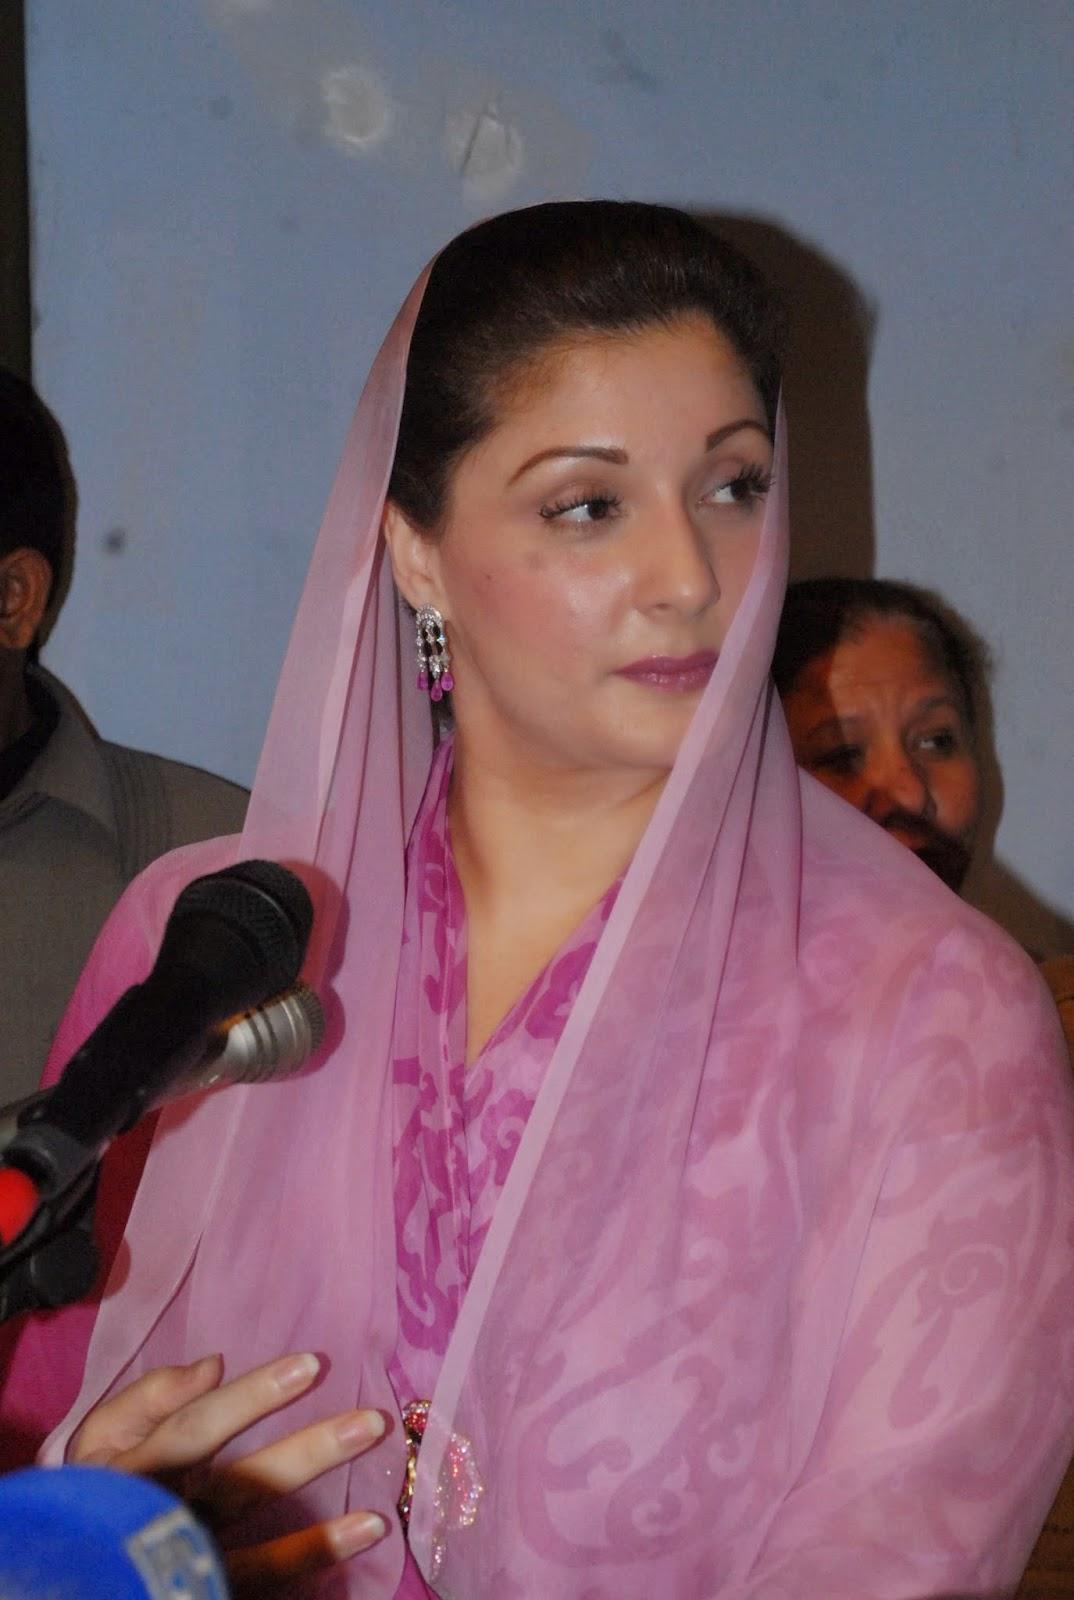 Hot And Sexy Politician Photos Of Maryam Nawaz In Green Dress